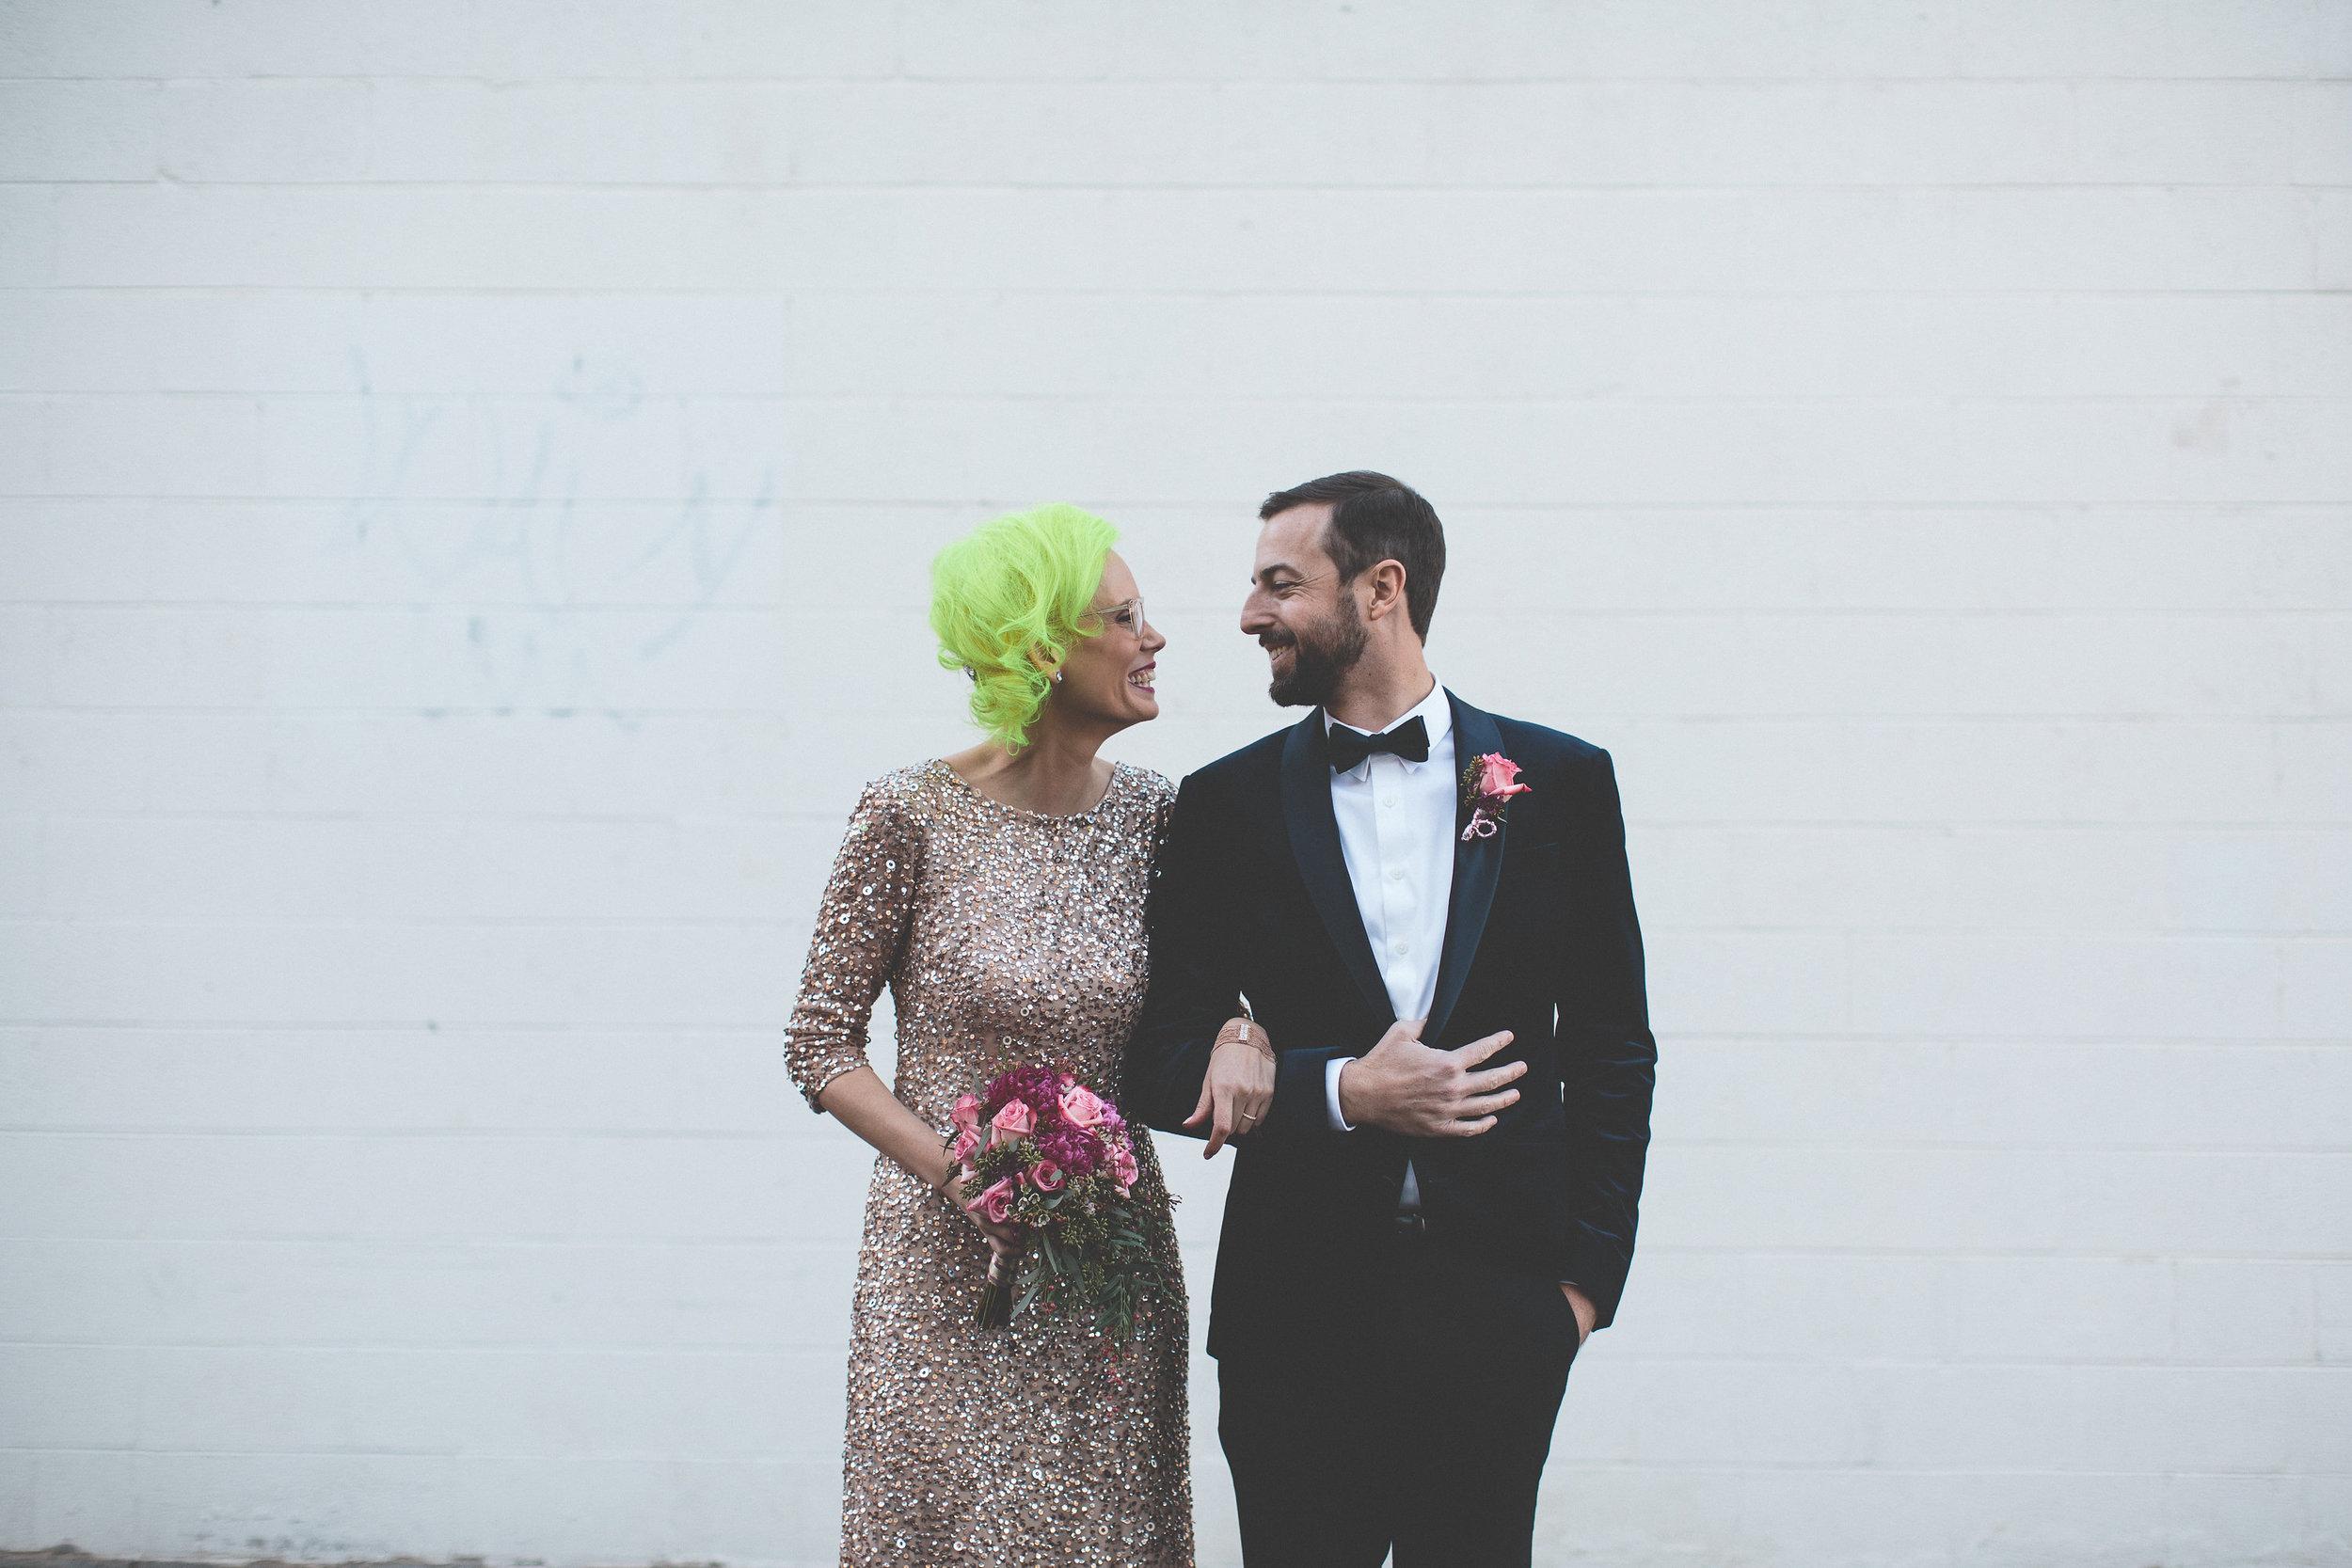 katie-and-erics-bright-downtown-las-vegas-elopement11.jpg